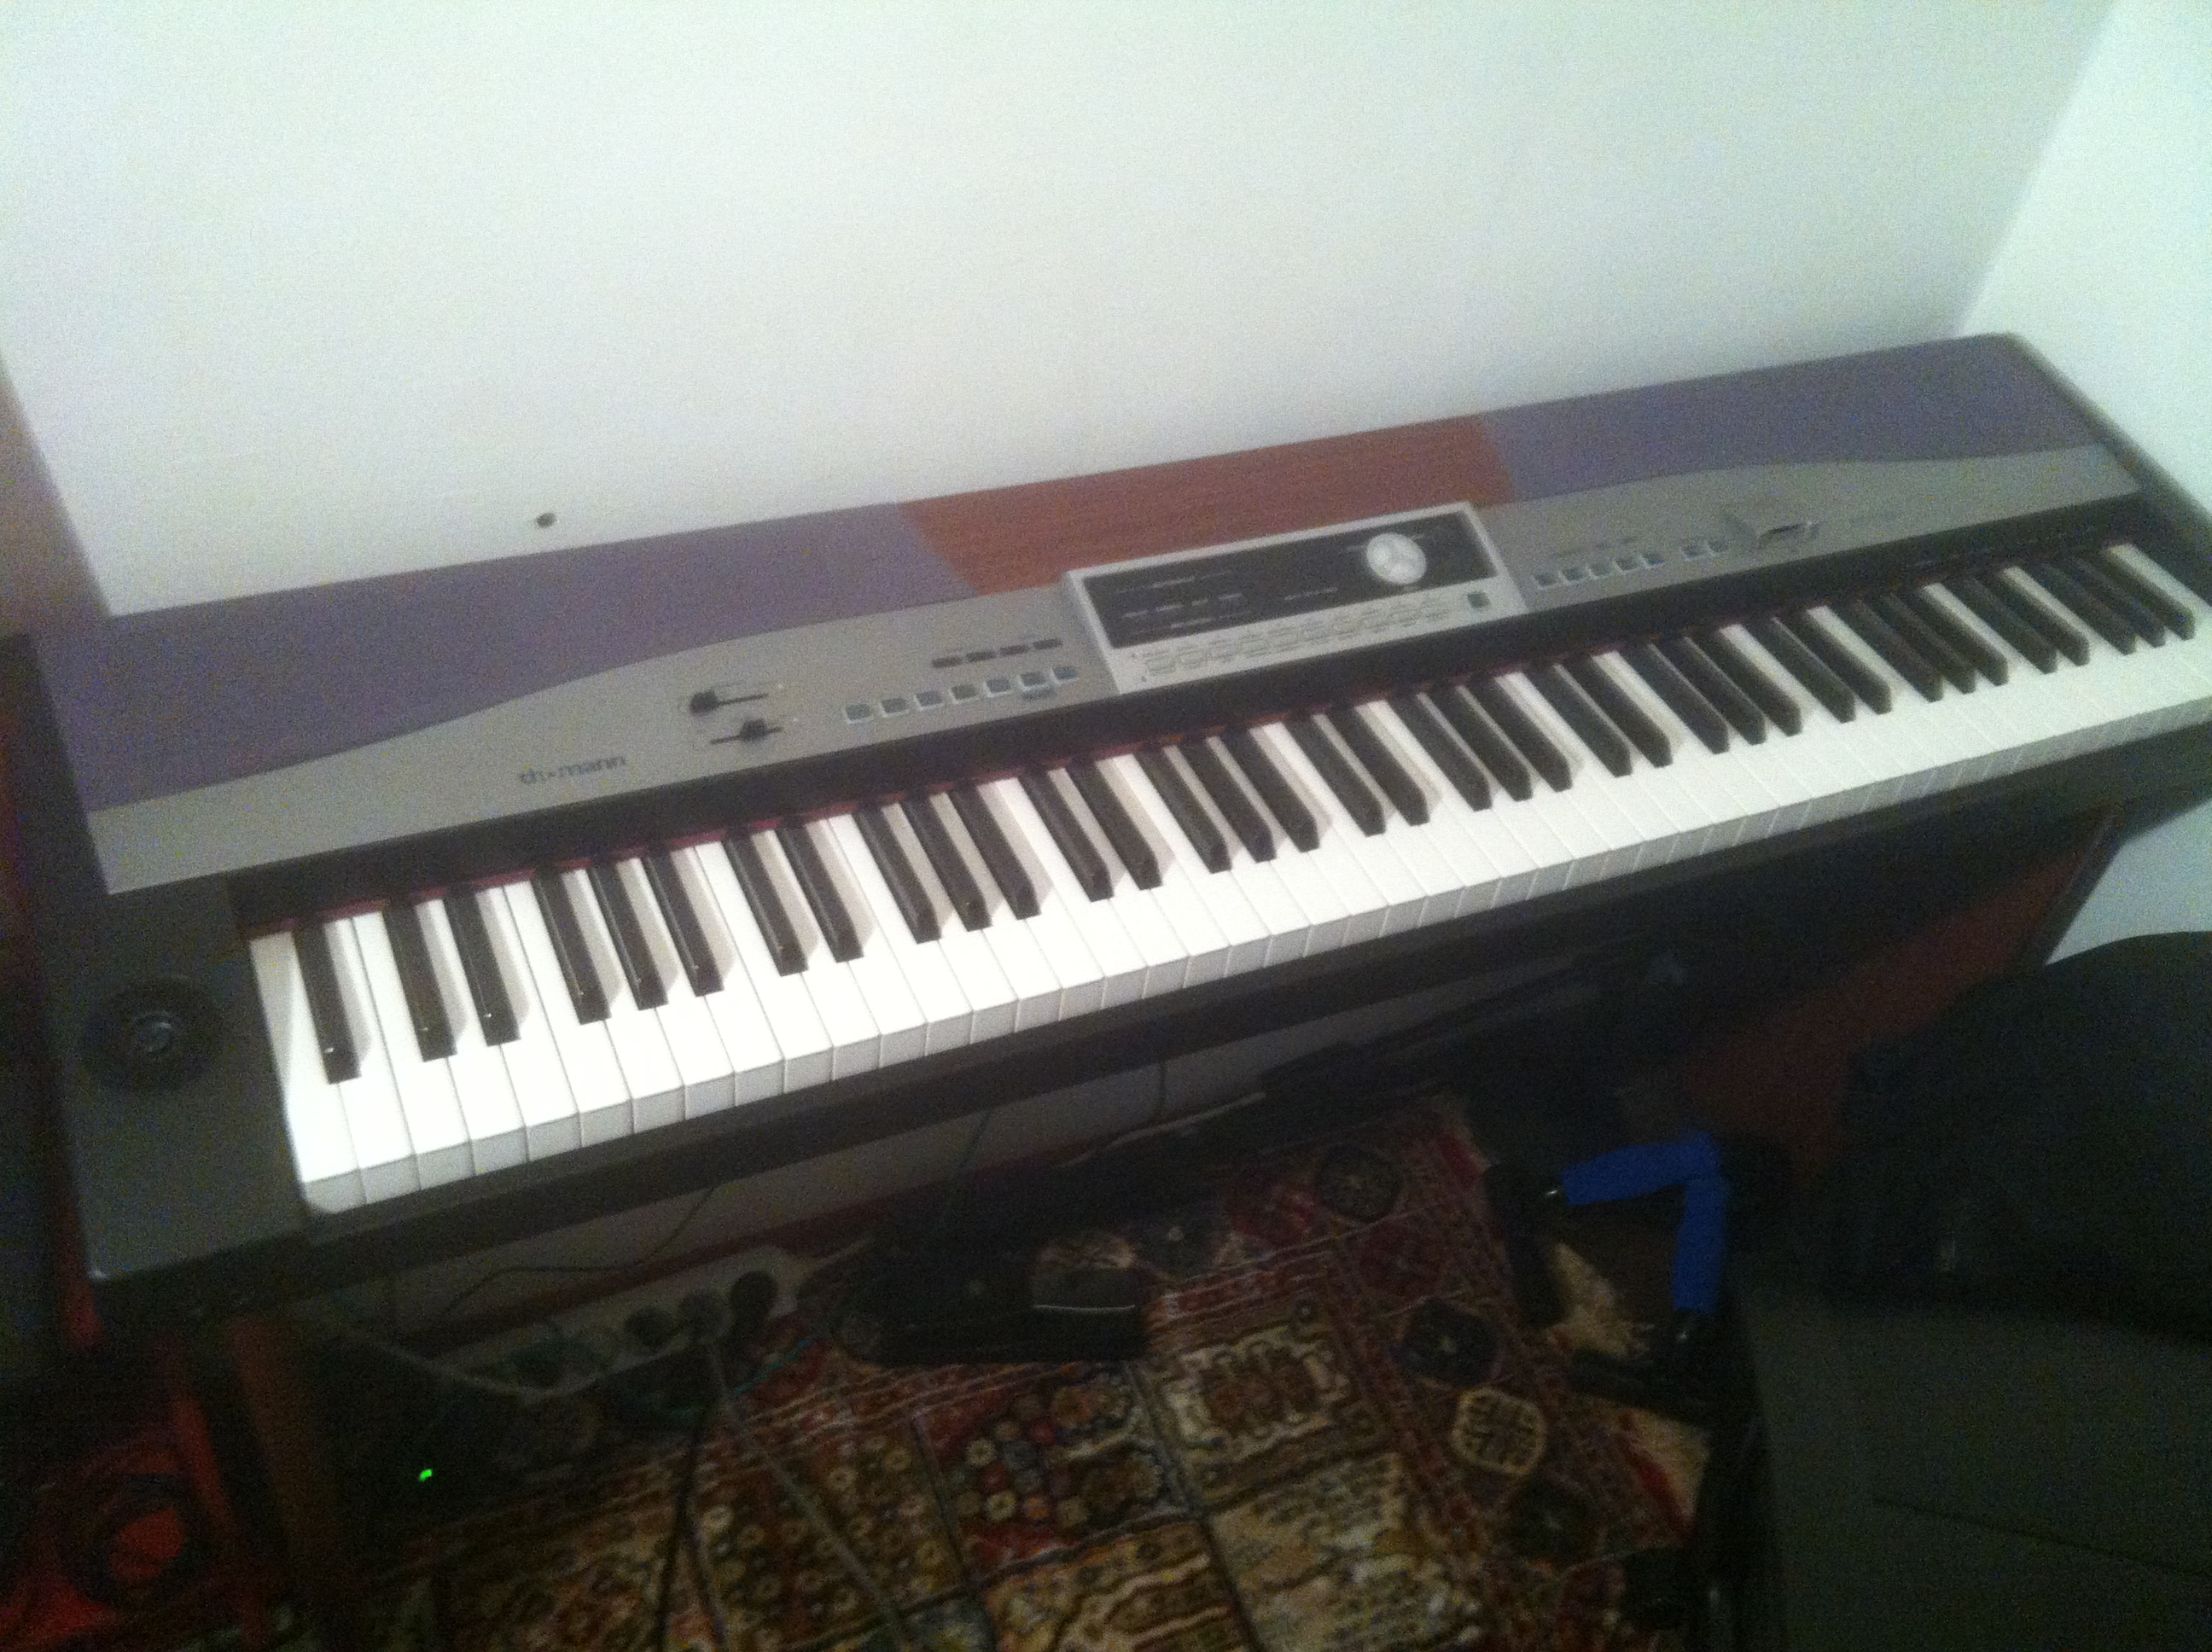 vends piano thomann sp 5100 ile de france audiofanzine. Black Bedroom Furniture Sets. Home Design Ideas